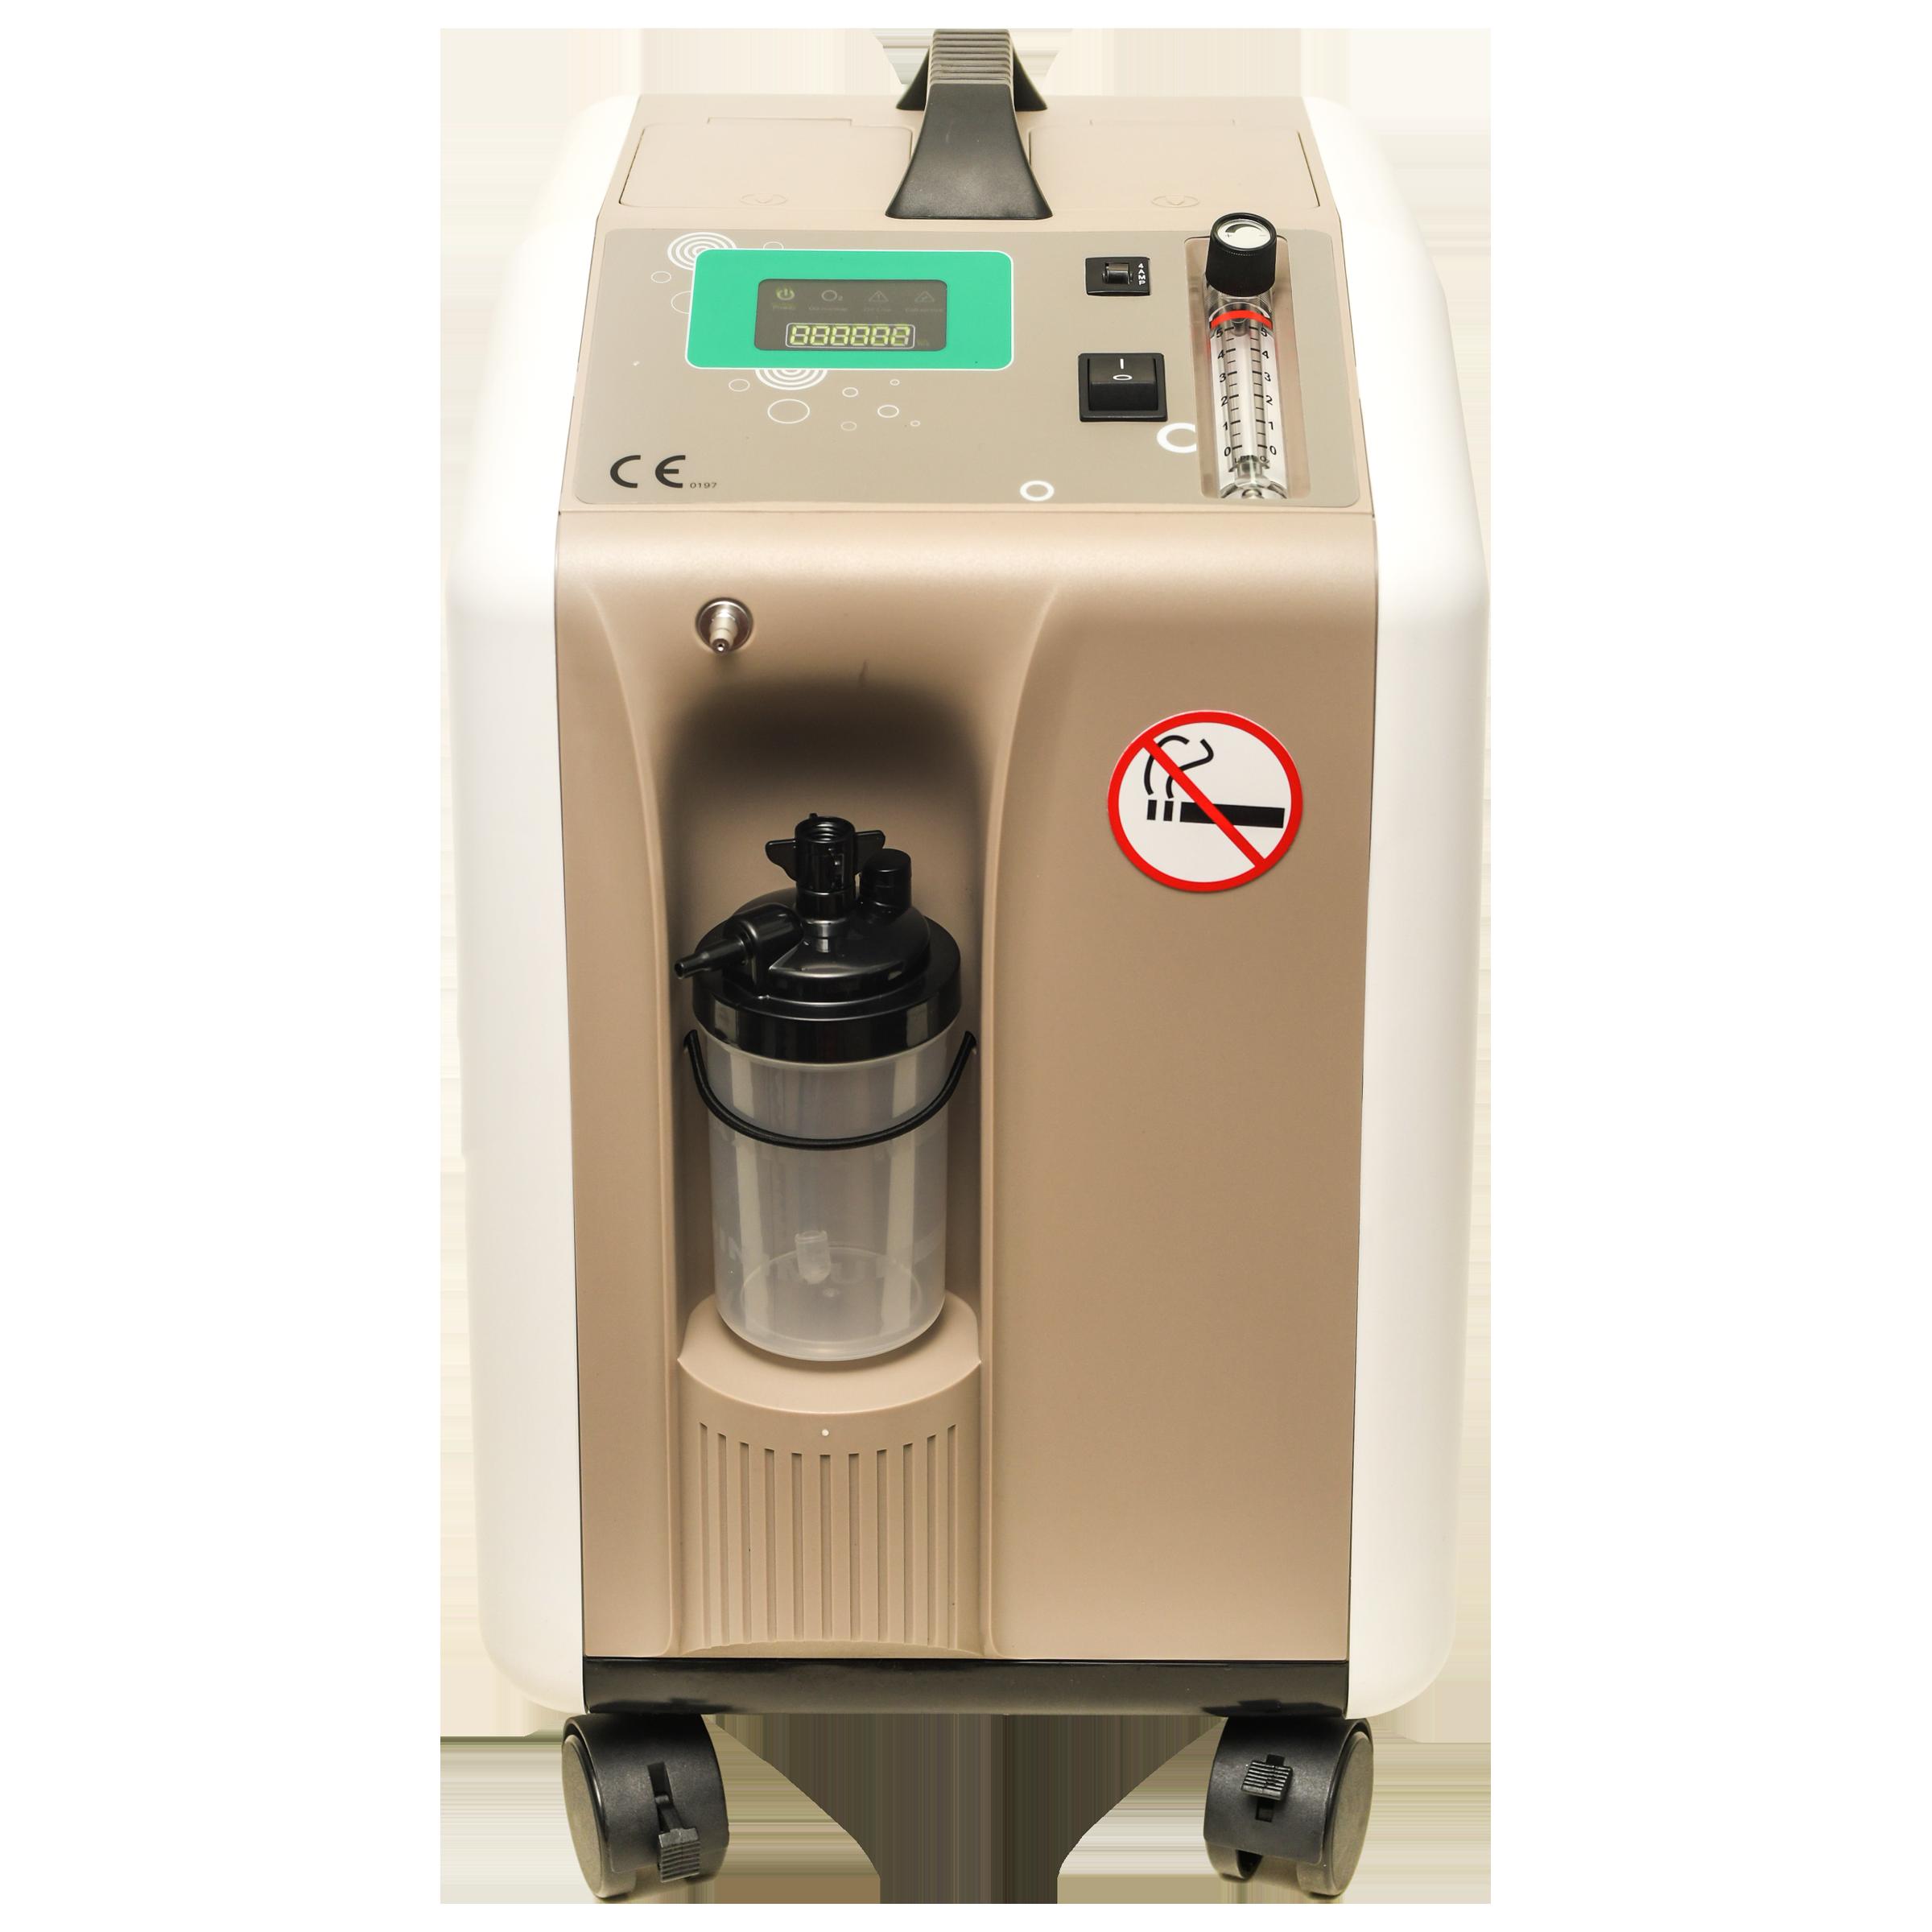 VedMed Healthcare MIC Oxygen Concentrator (Flow Speed: 05 LPM, Oxygen  Purity 93% + - 3%, VMMOC5, Beige)_1